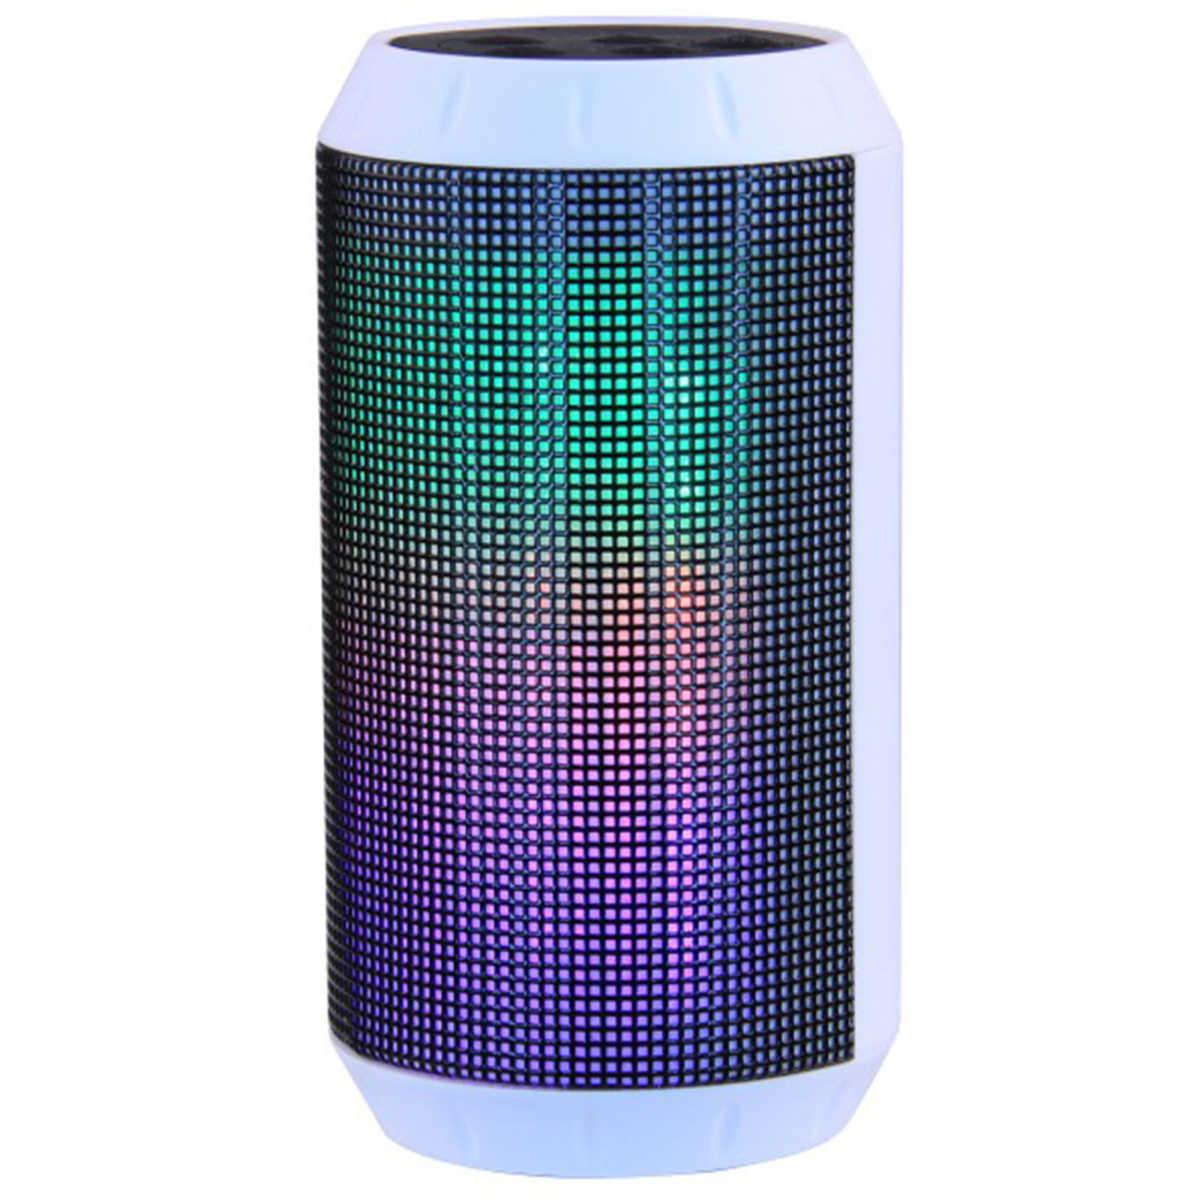 Laser Wireless Speaker with LED Lights  FM Radio